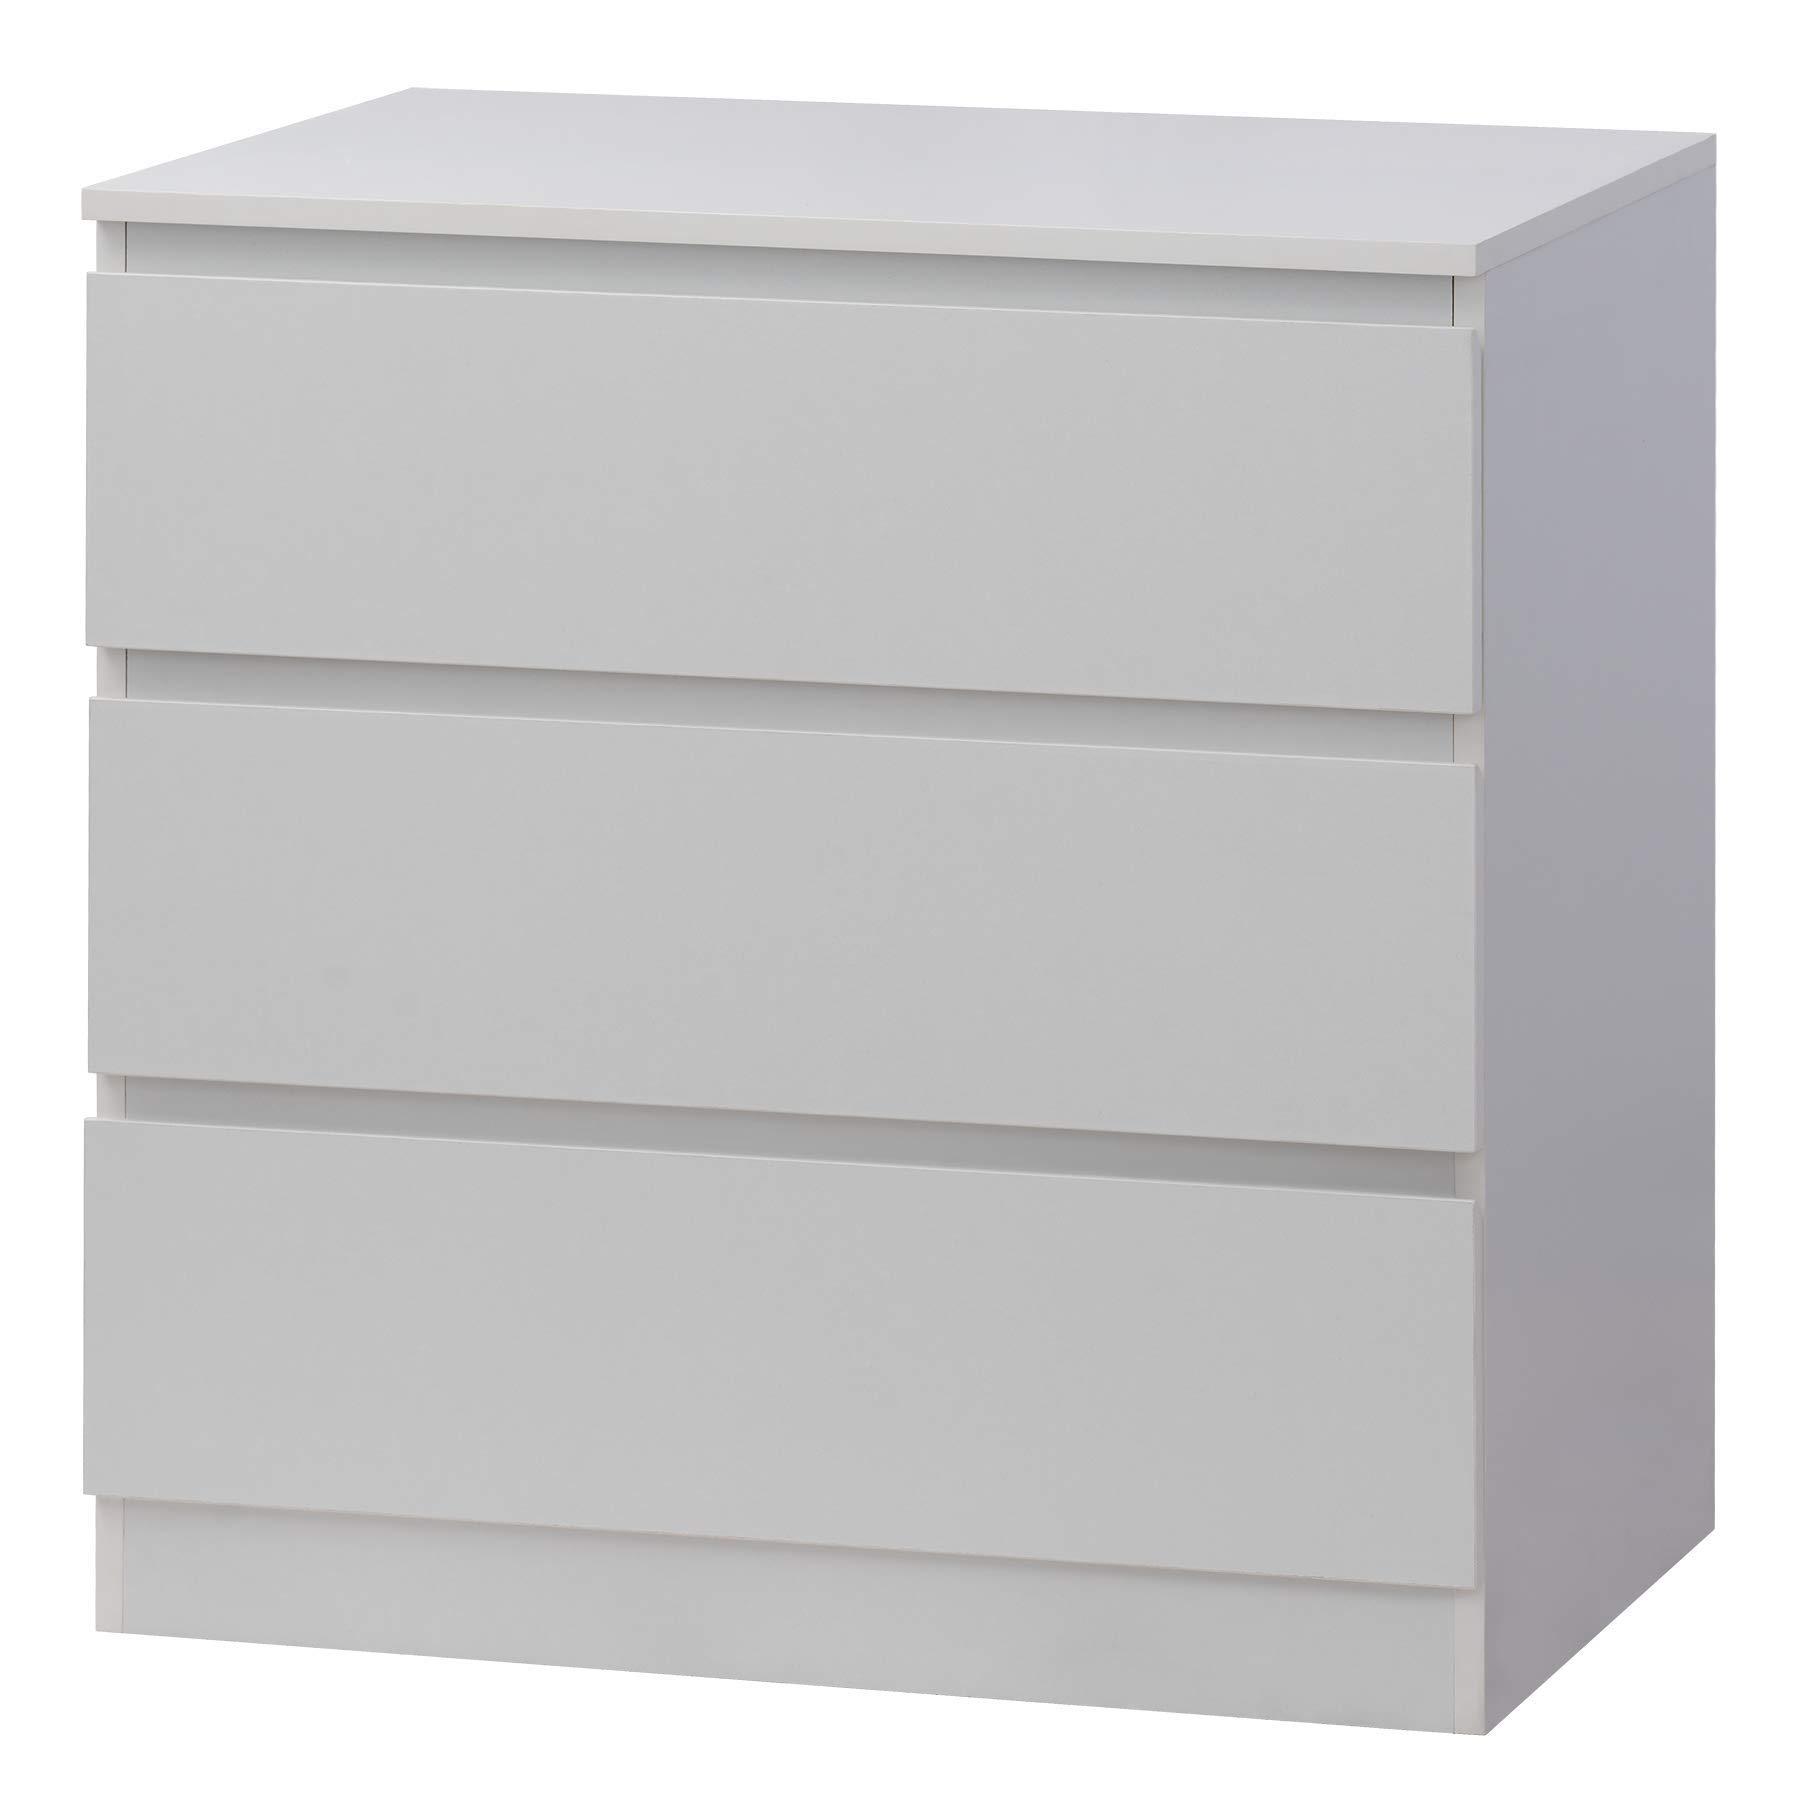 Fineboard FB-DS03-W Storage Dresser with 3 Drawers Universal Organizer Unit, White